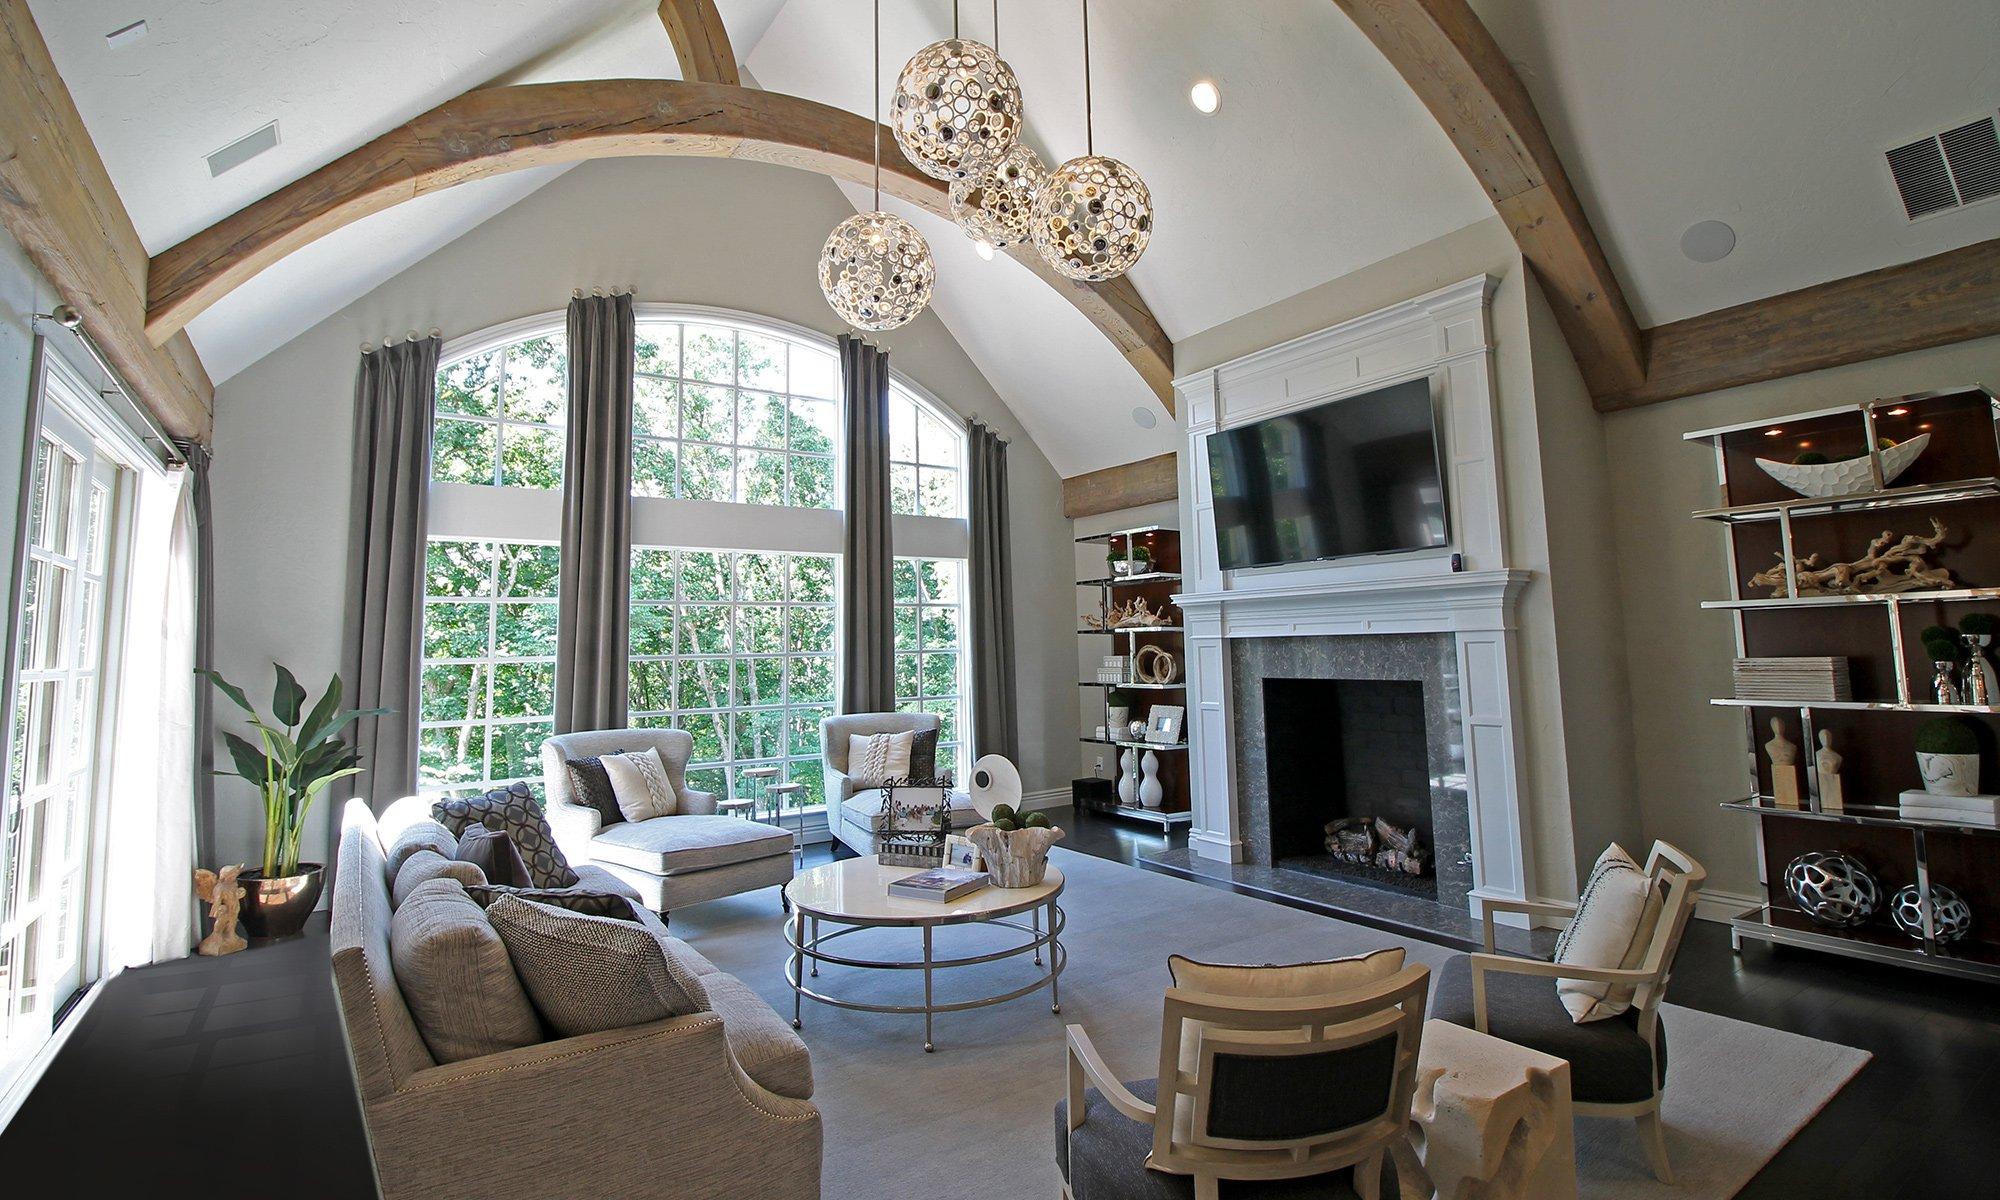 417 Home Design Awards 2017: Whole House, Living Room